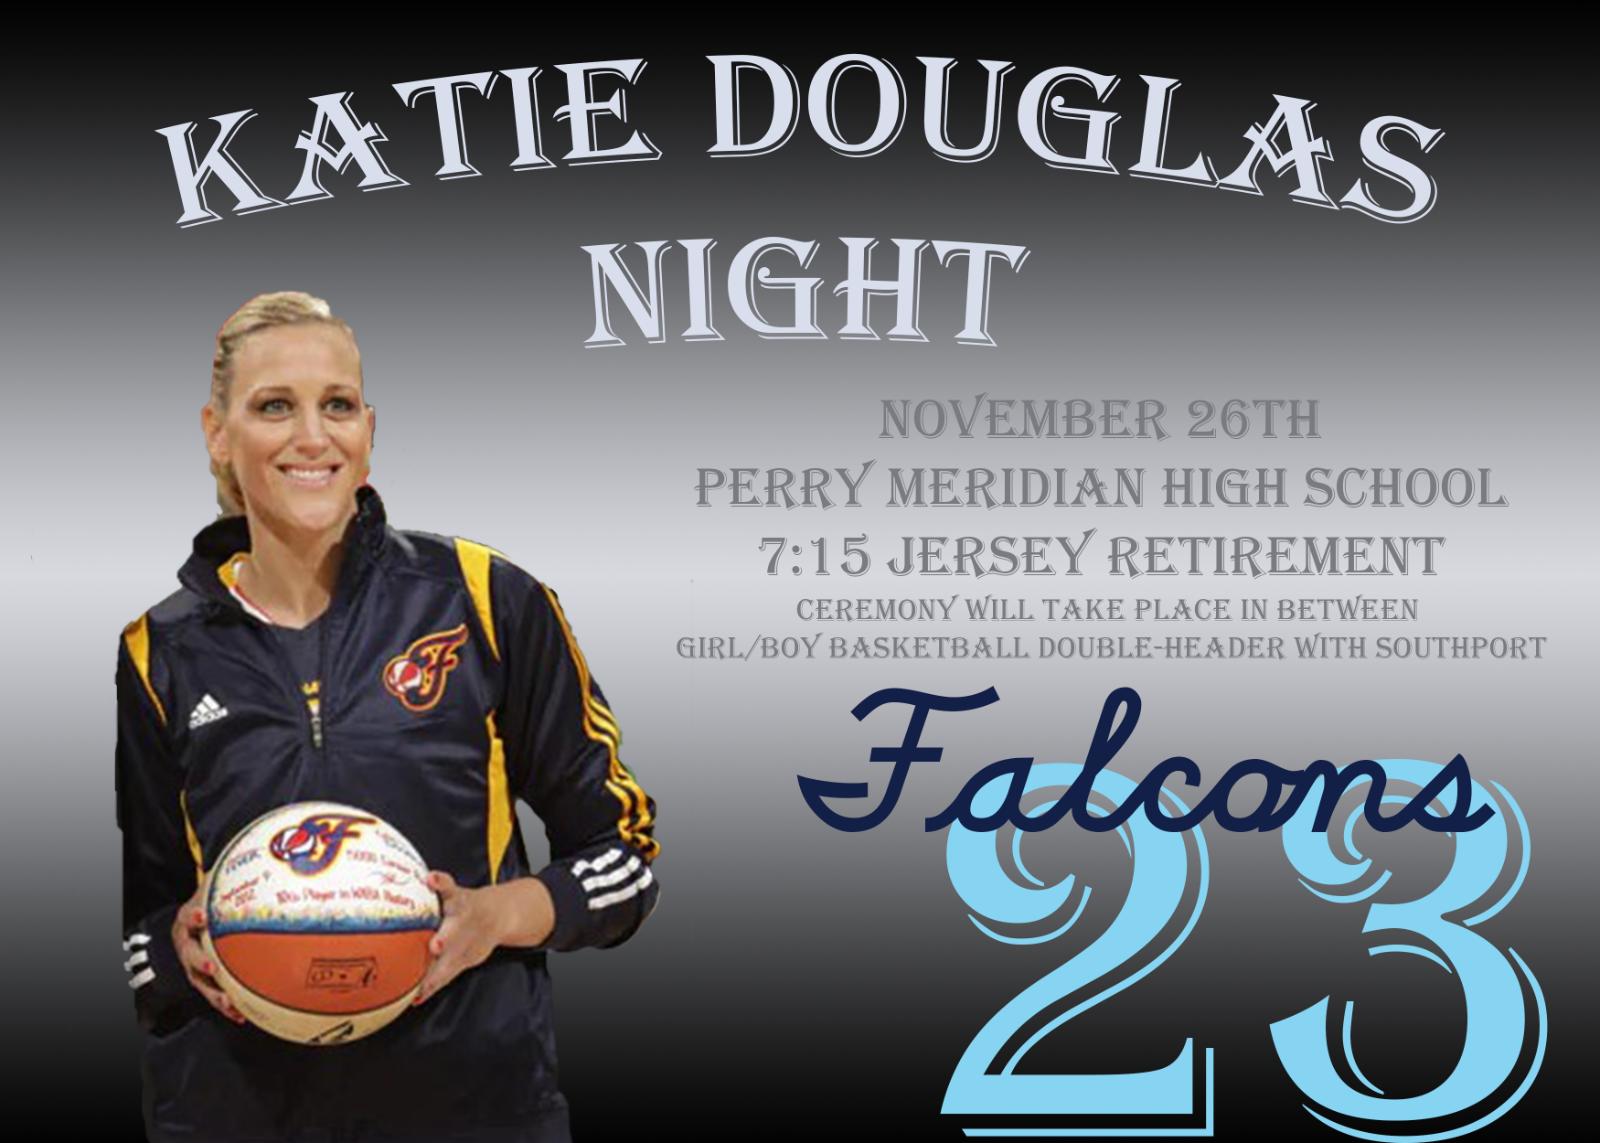 Alumni Katie Douglas to be honored